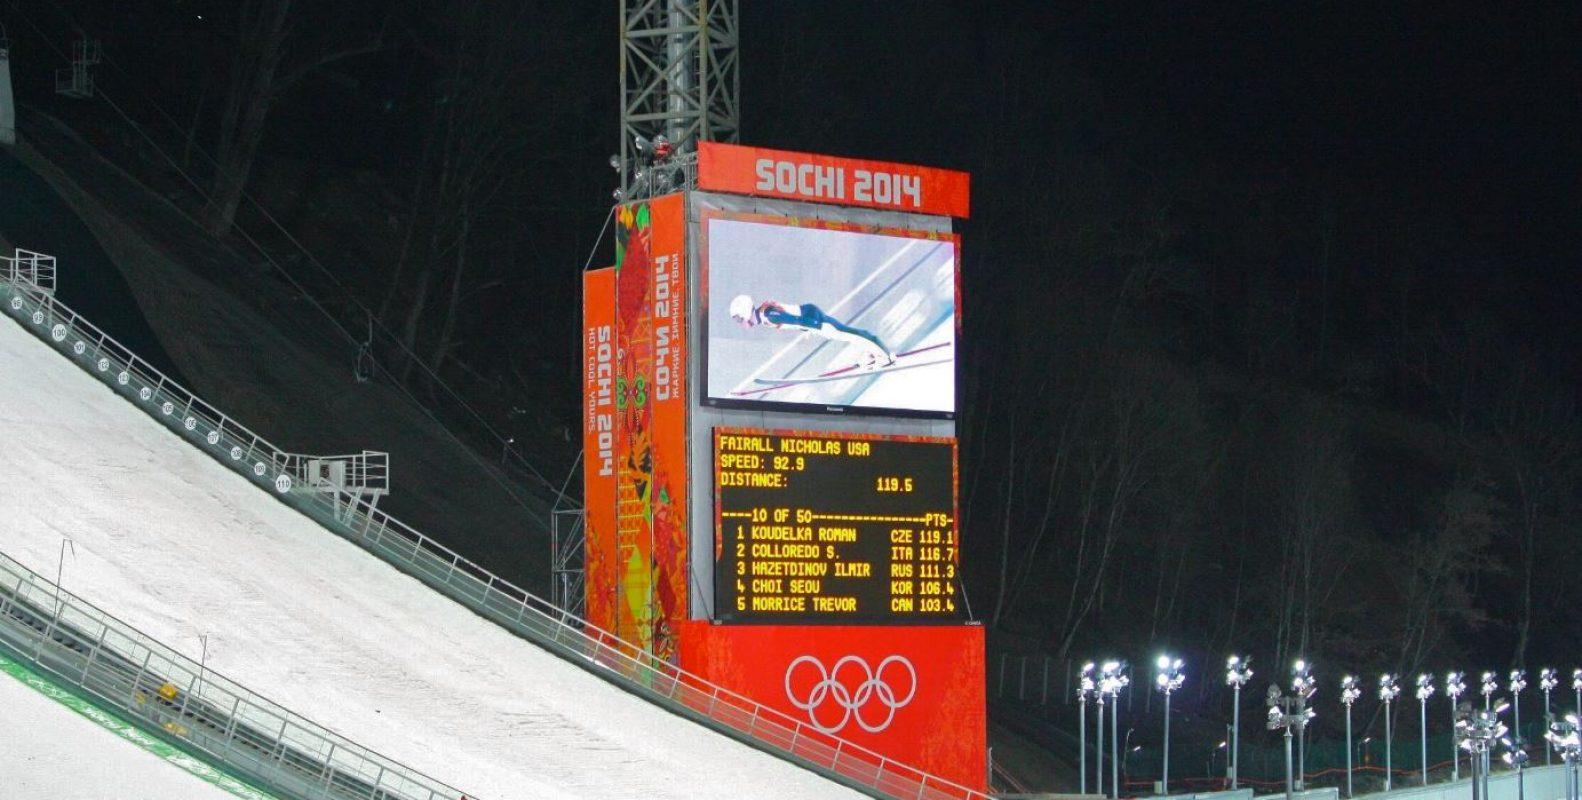 Giant LED screen Olympic Games Sochi